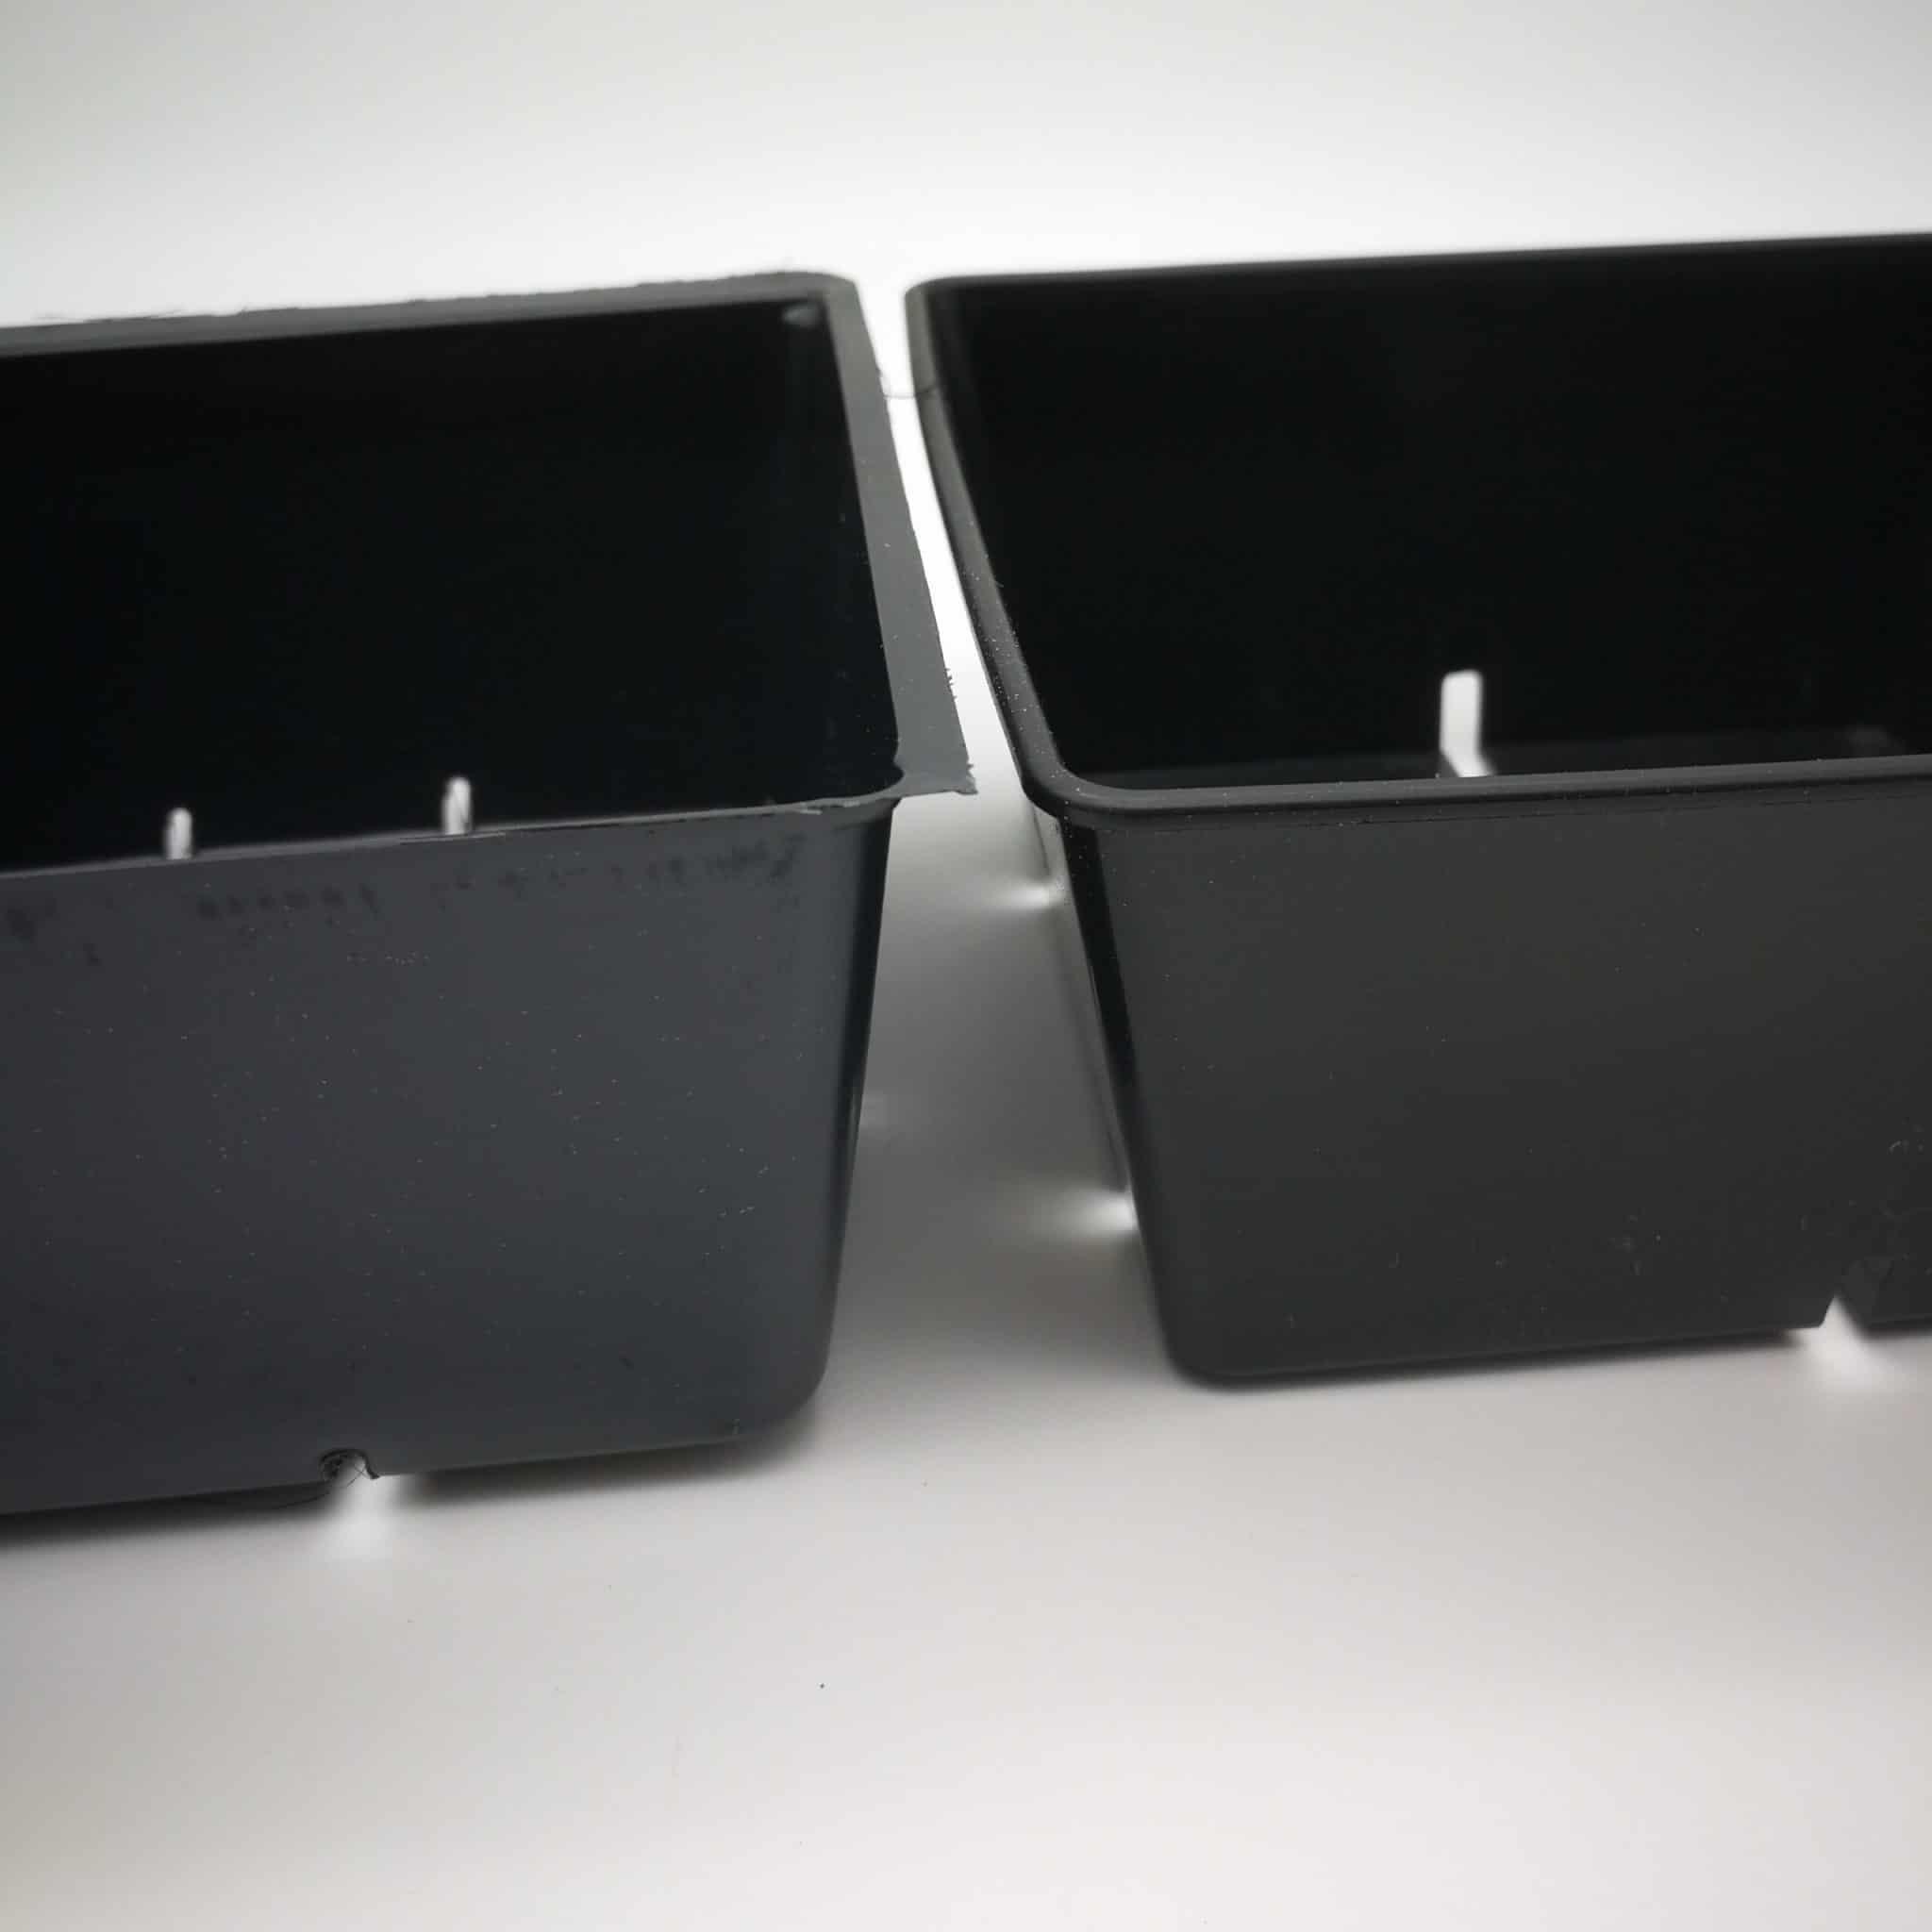 Vergleich Microgreen Tray 5x5 & Microgreen Topf